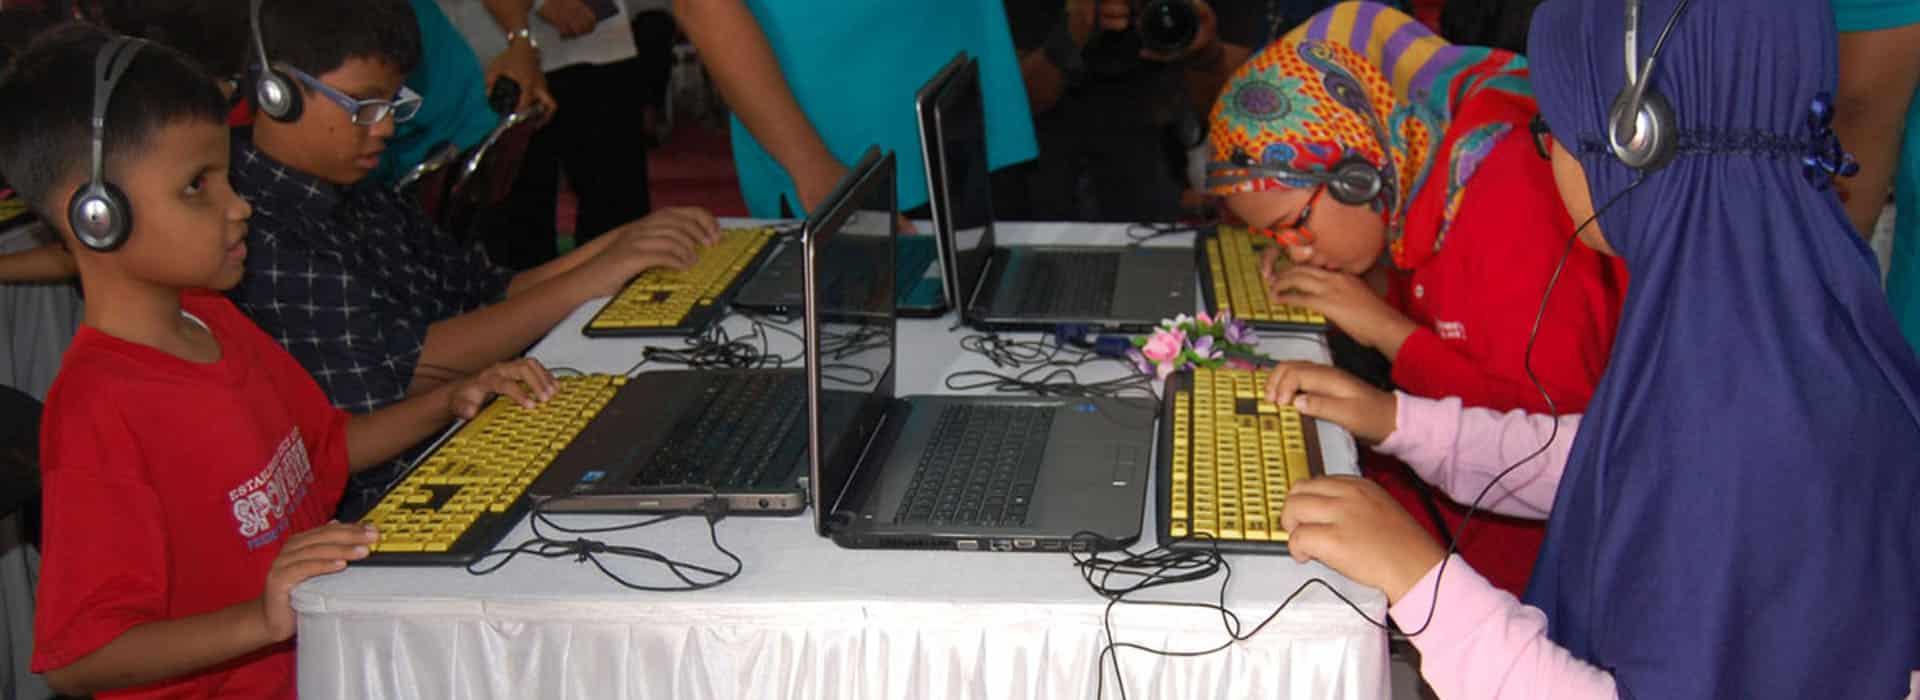 Teman-teman sedang belajar komputer bicara